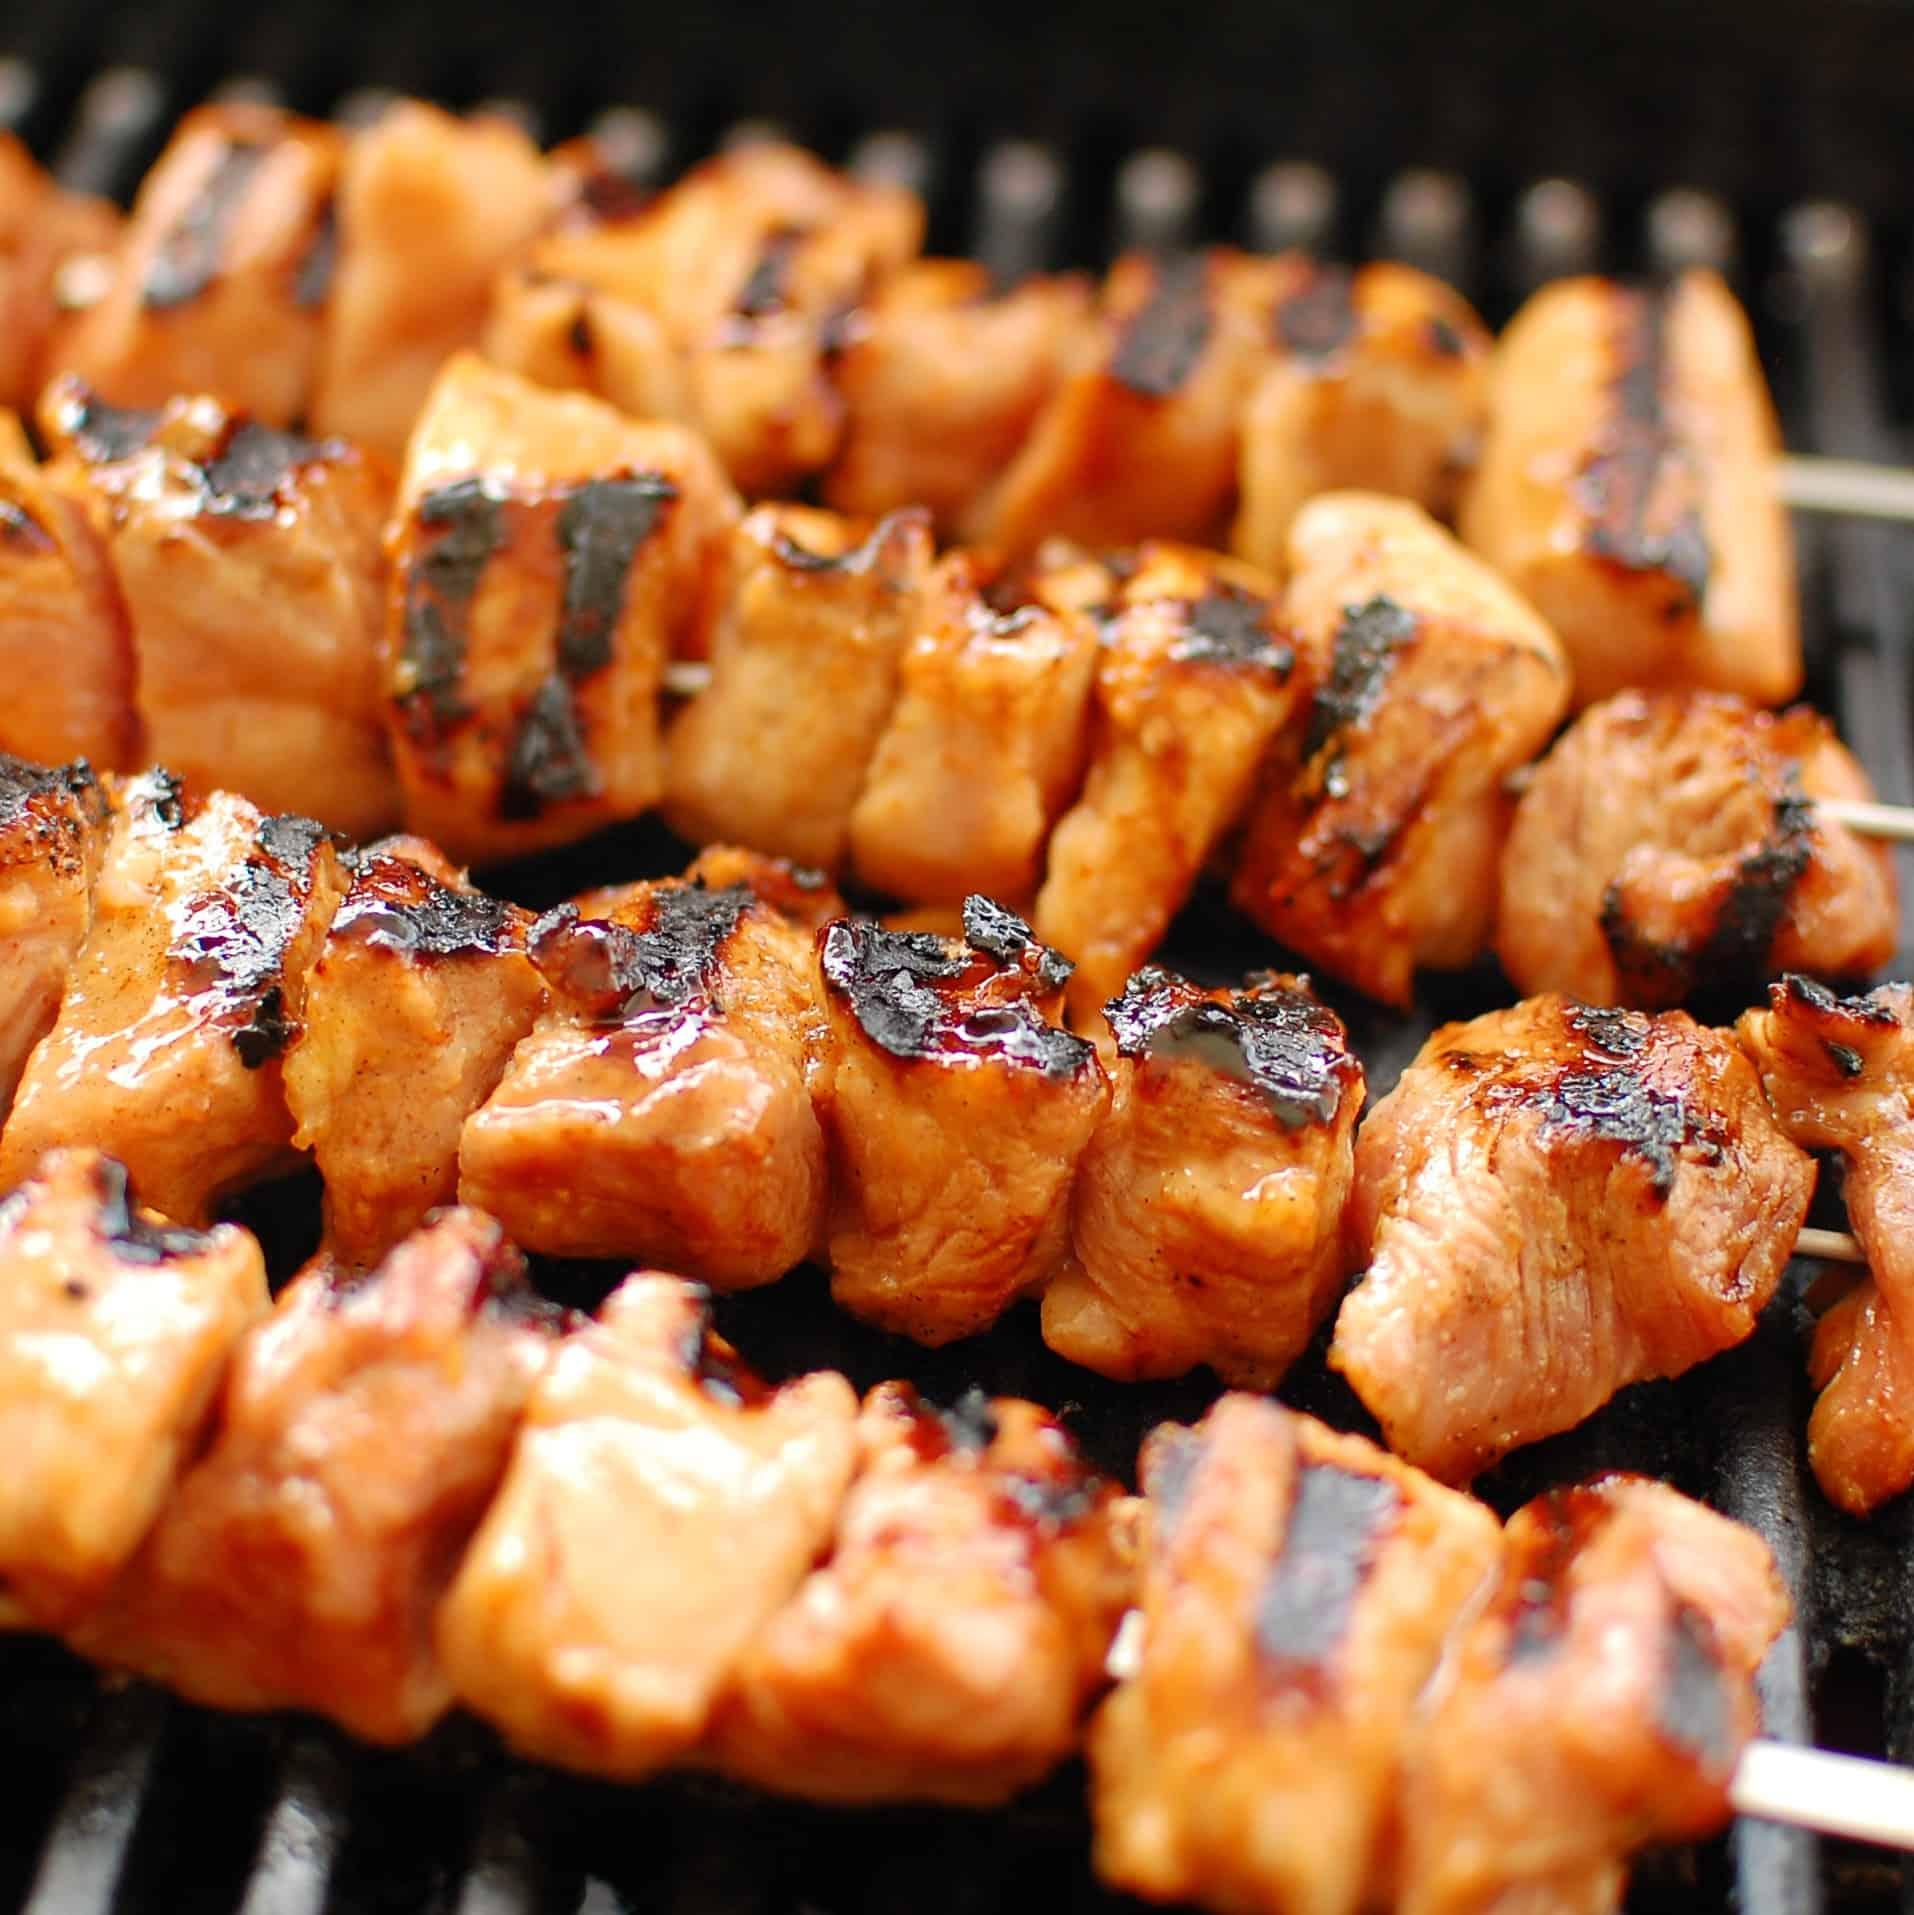 Best Grilled Pork Tenderloin: Grilled Pork Tenderloin